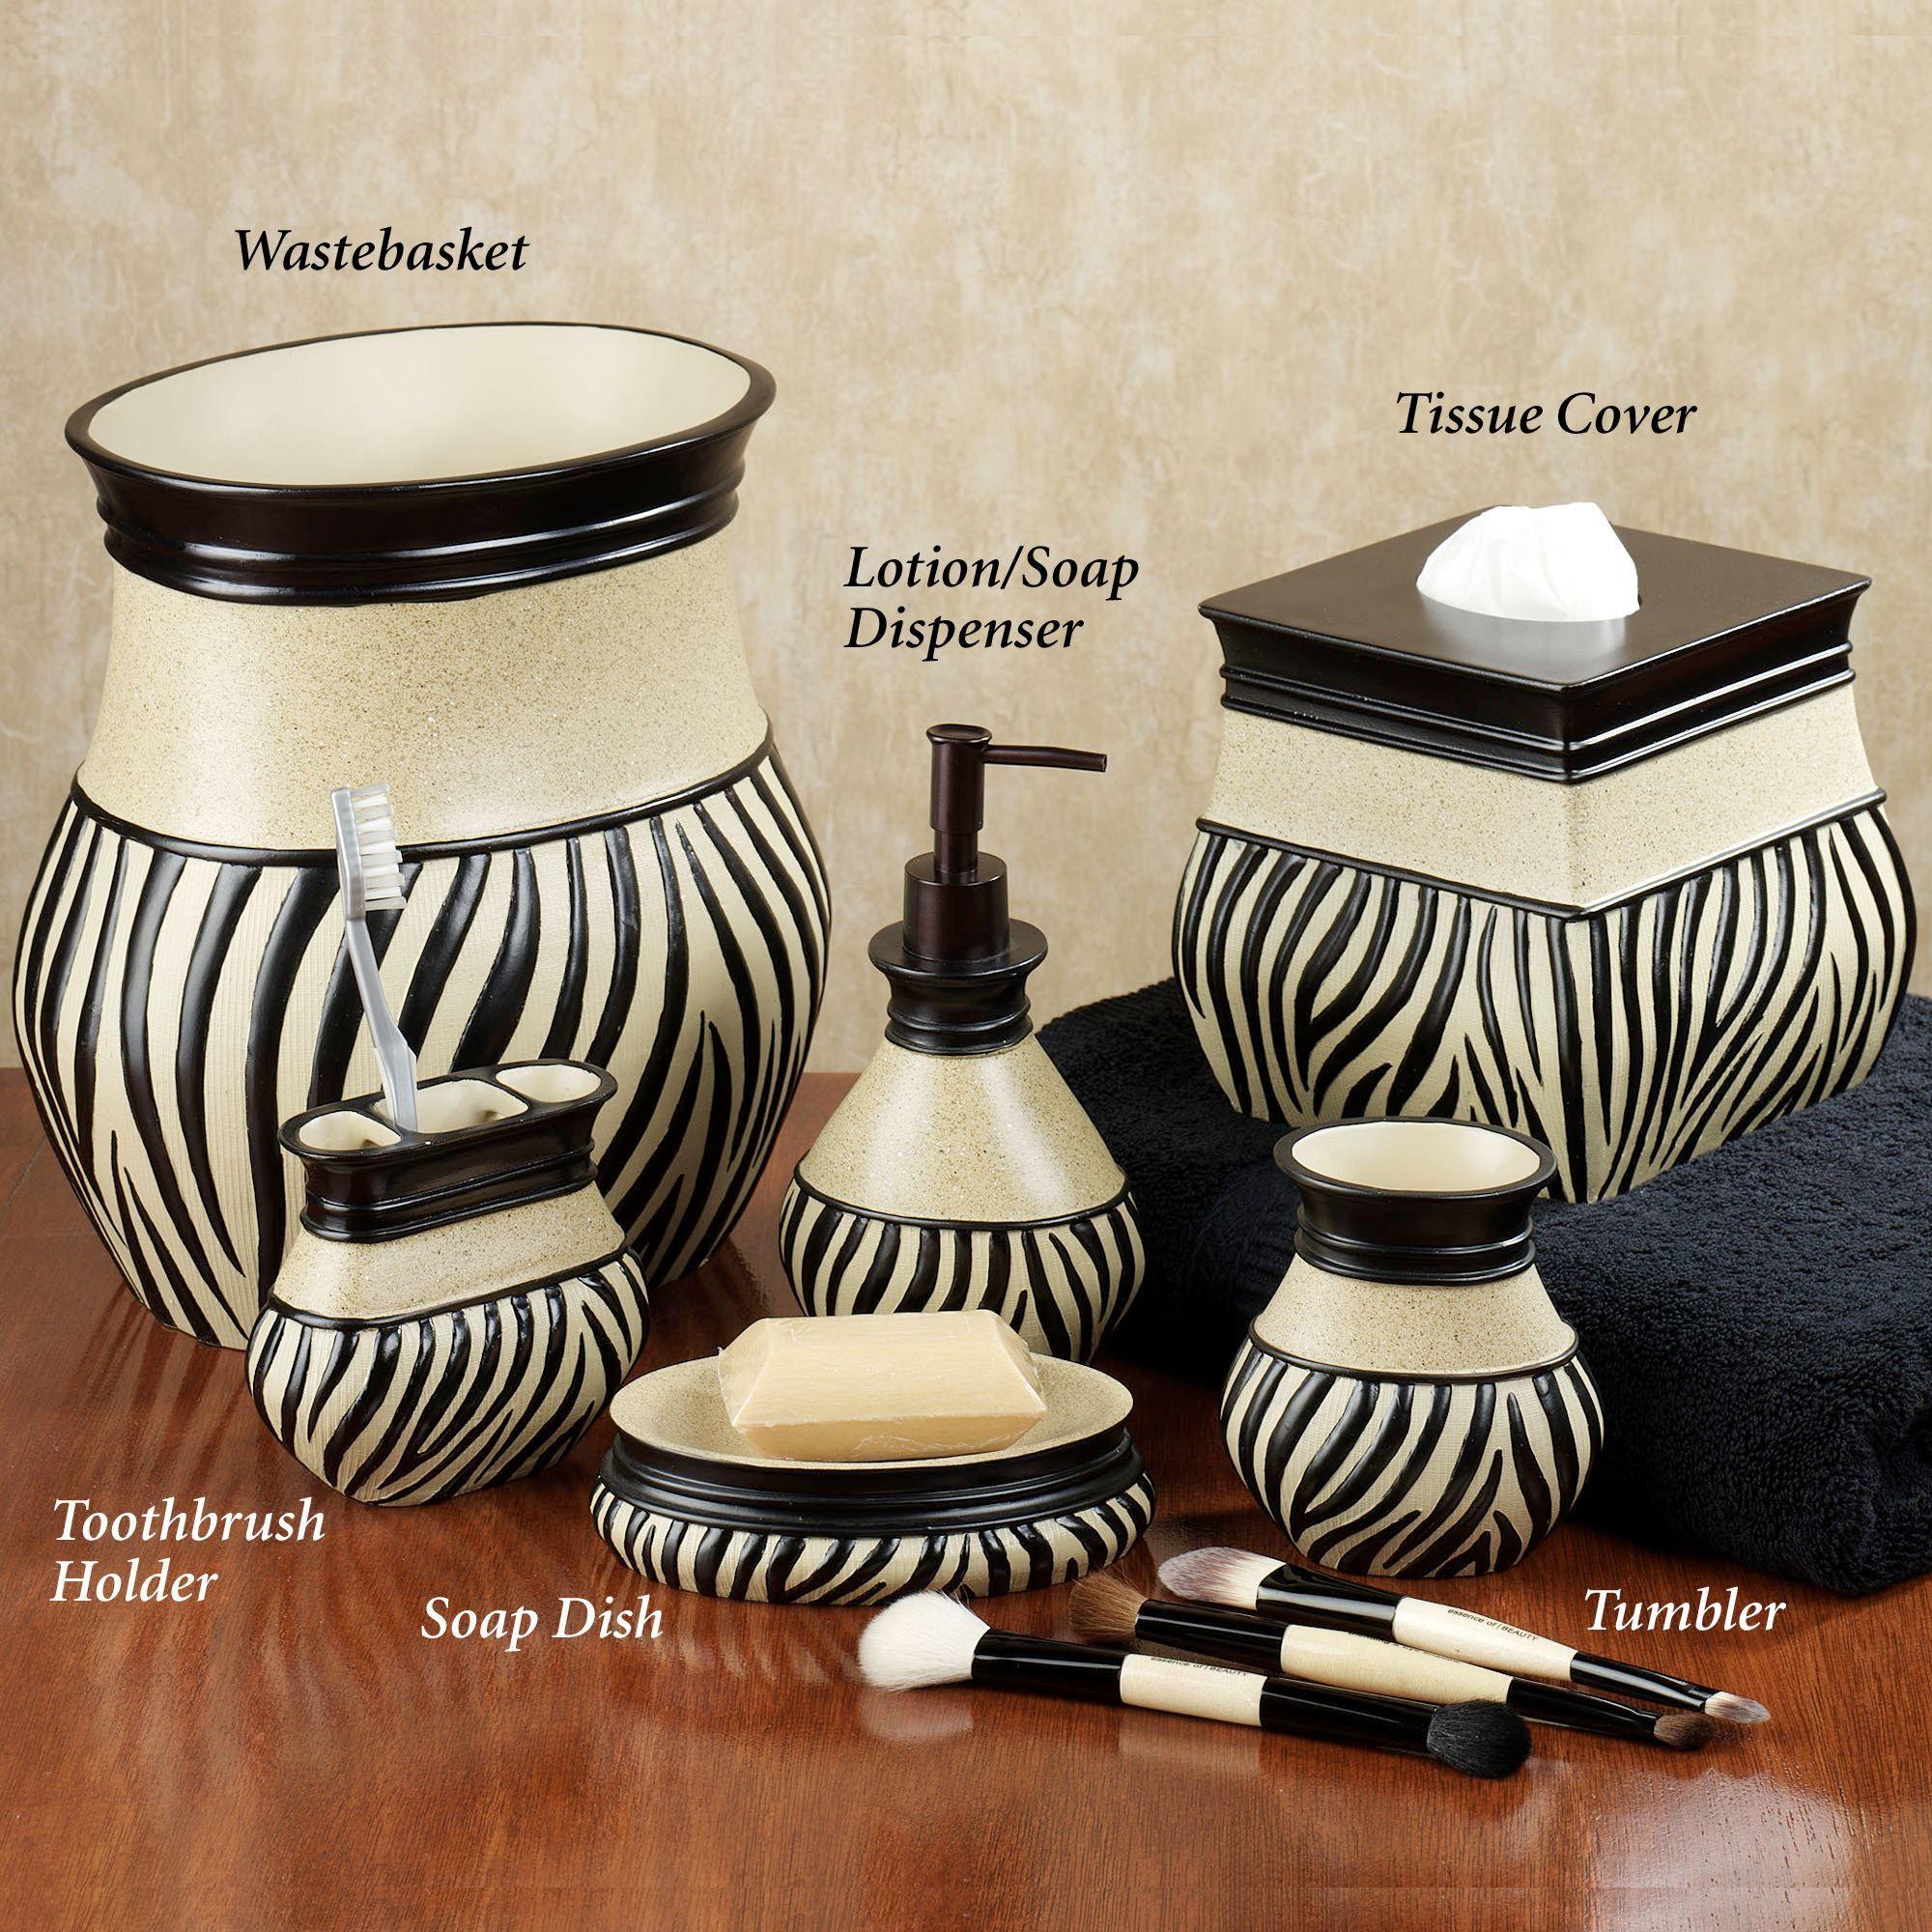 Superior Zuma Zebra Bath Accessories. Zuma Lotion Soap Dispenser. Click To Expand